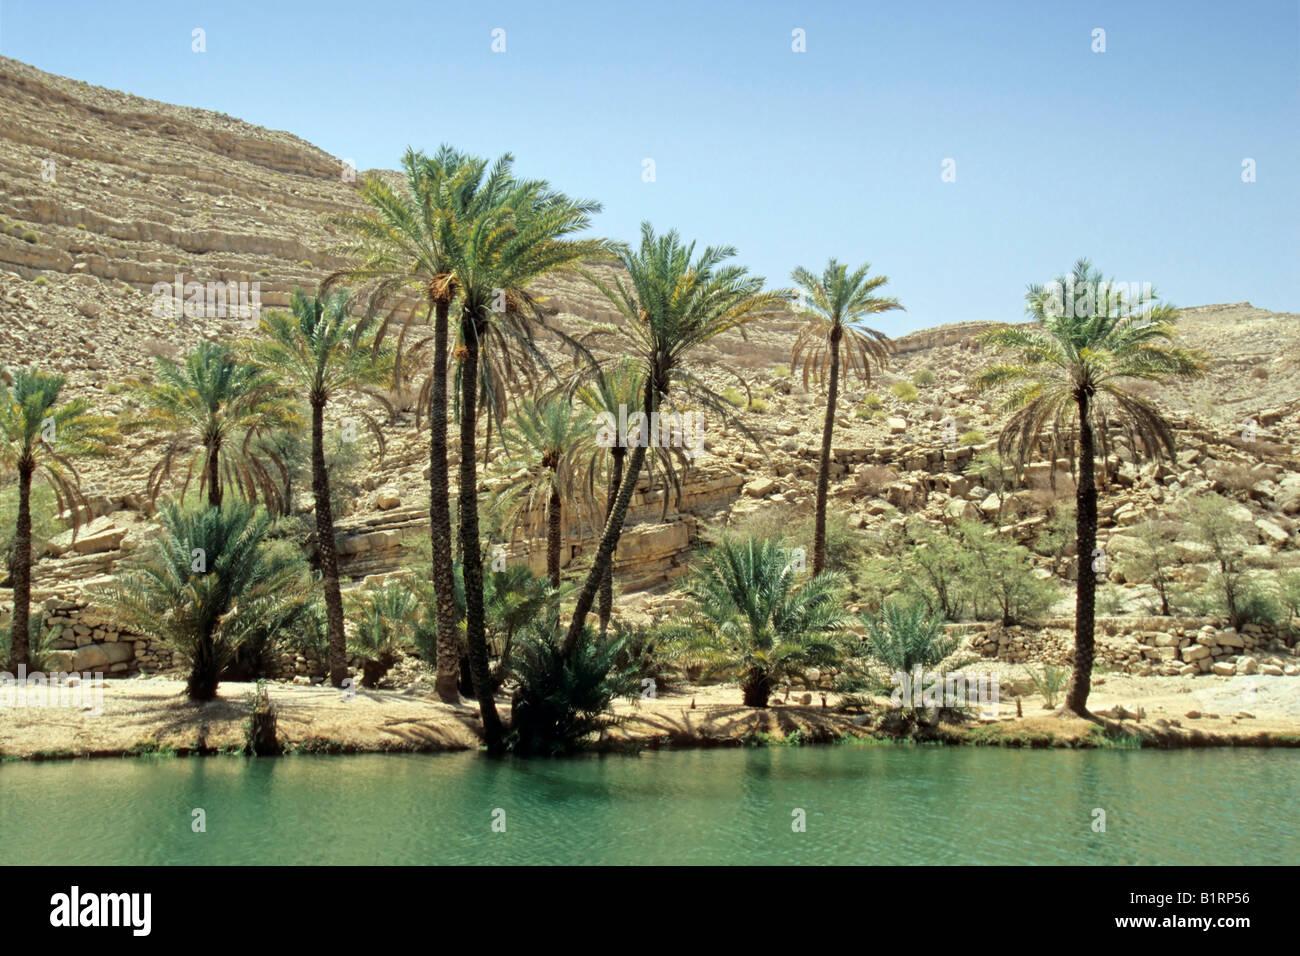 Wadi in einer felsigen Landschaft im Hadjar-Gebirge, Oman, Arabische Halbinsel, Naher Osten Stockbild